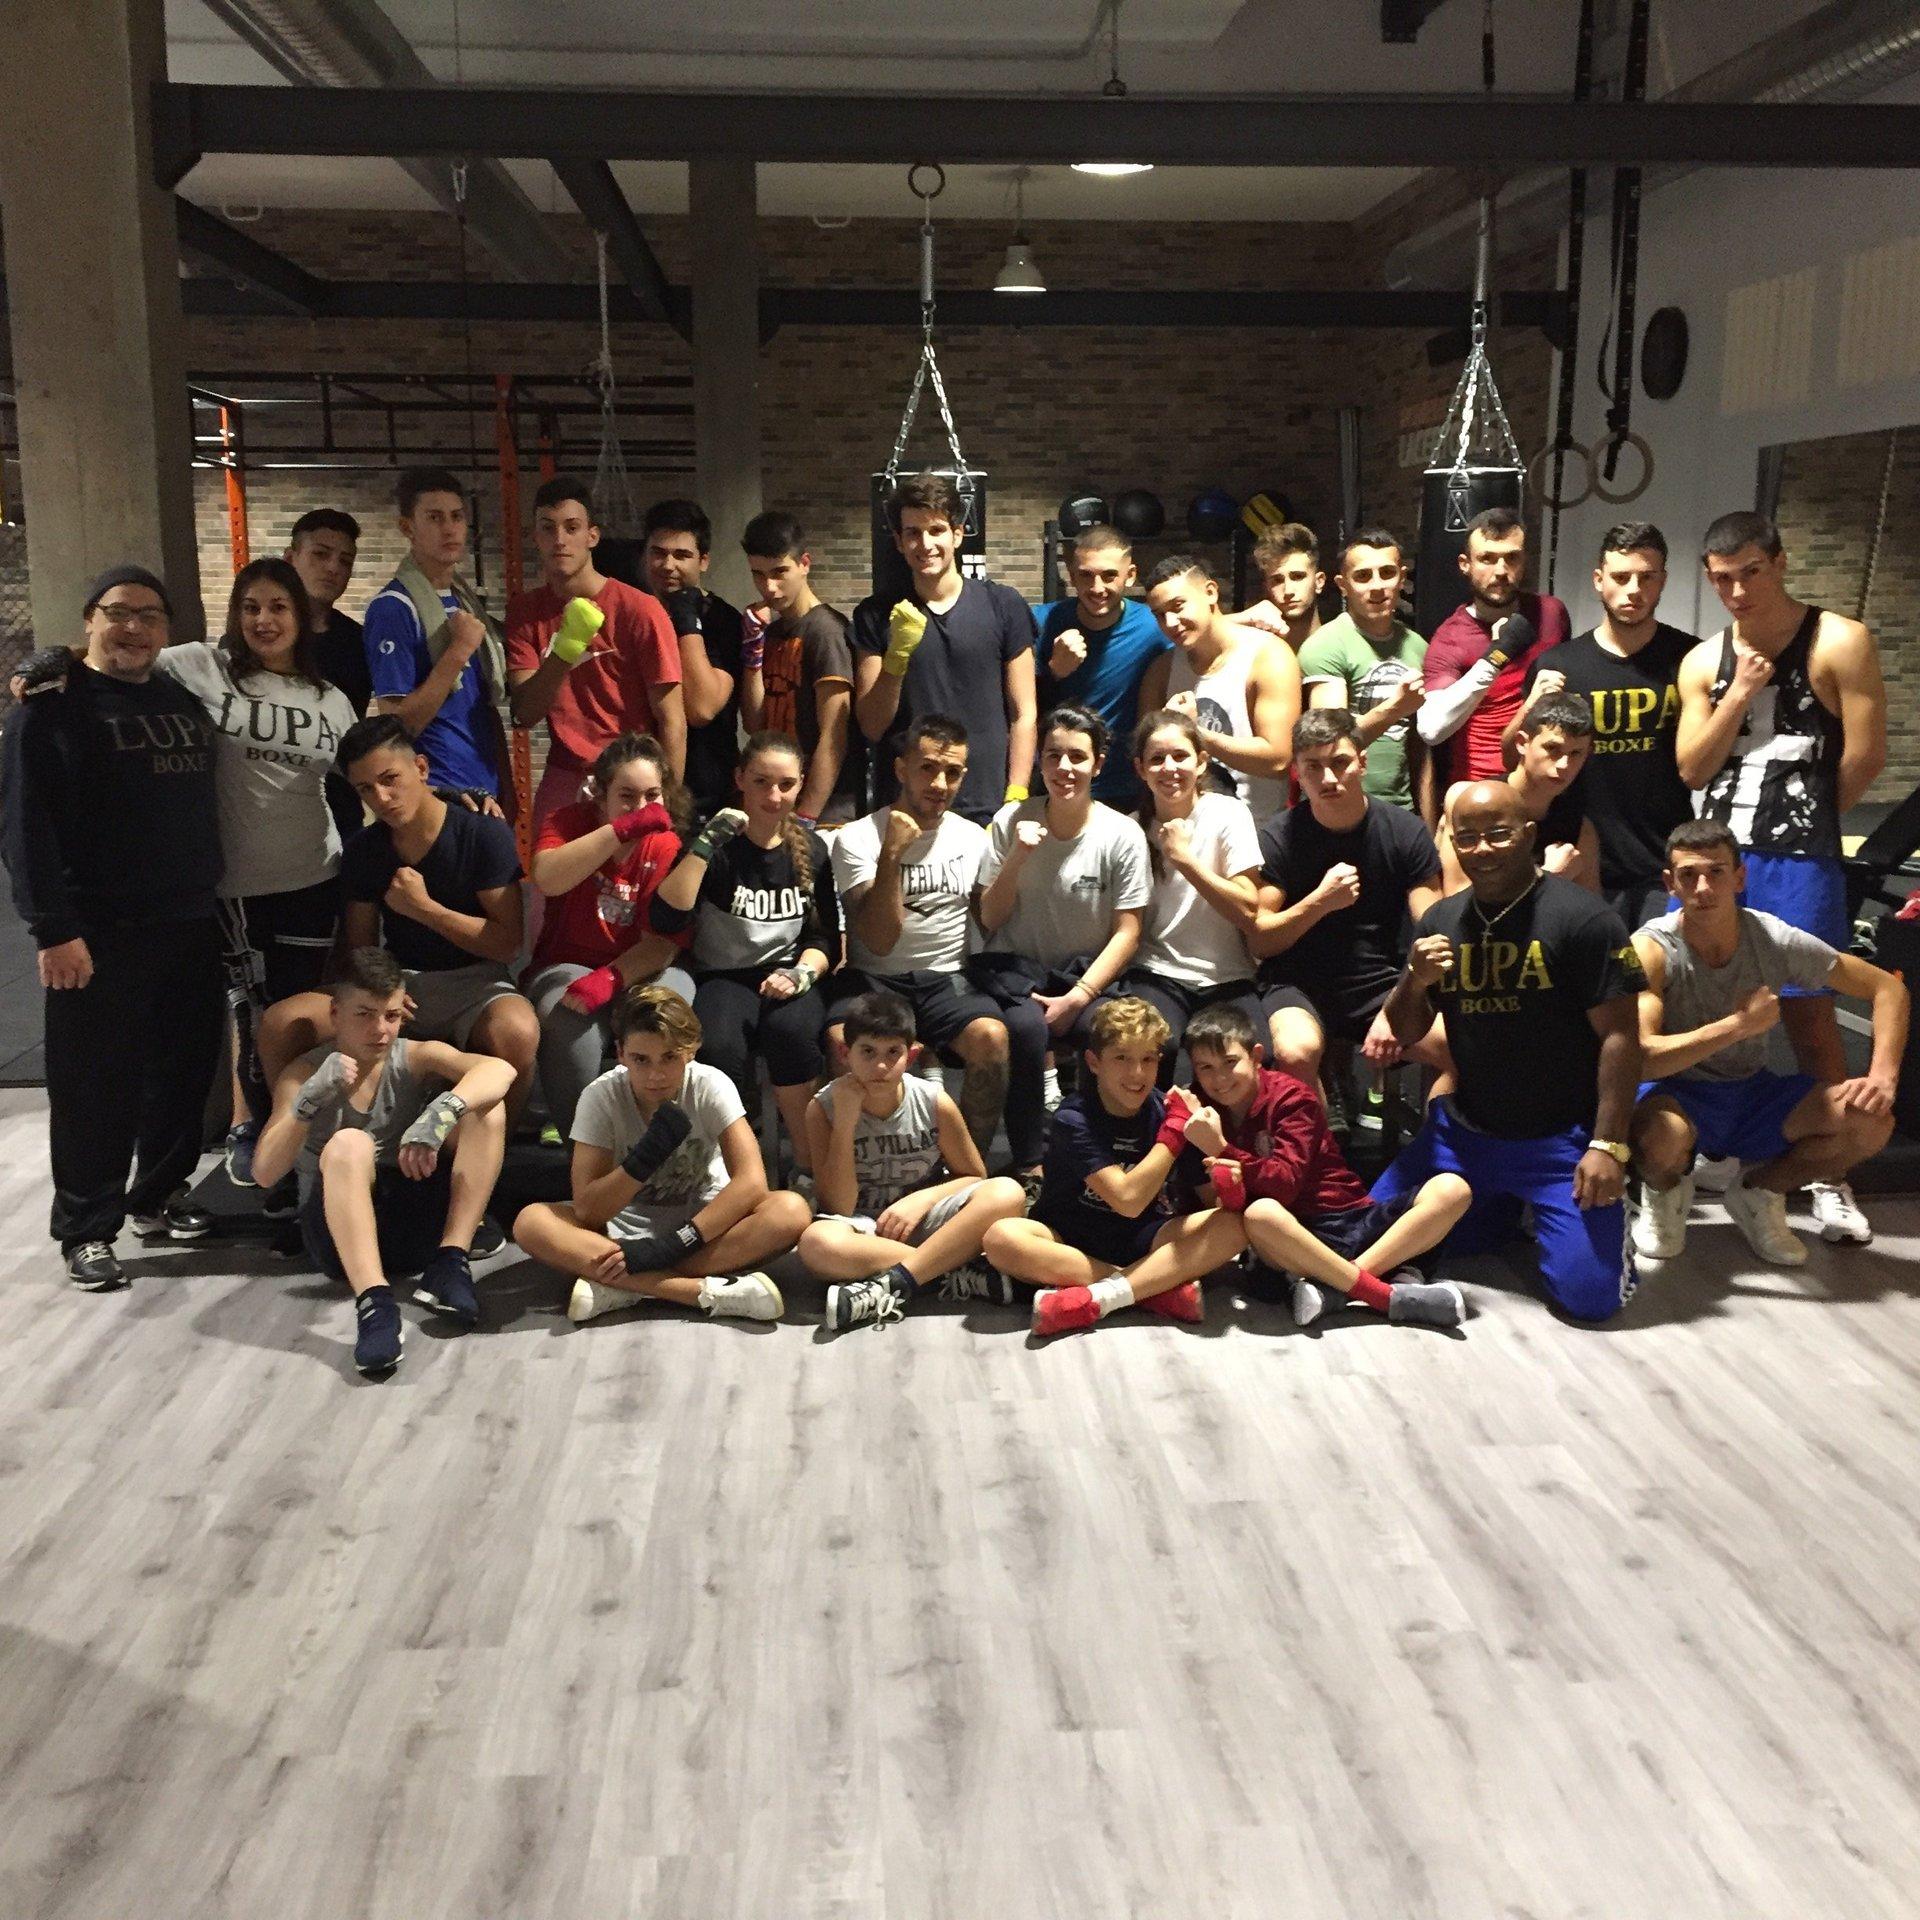 Lupa Sport Club